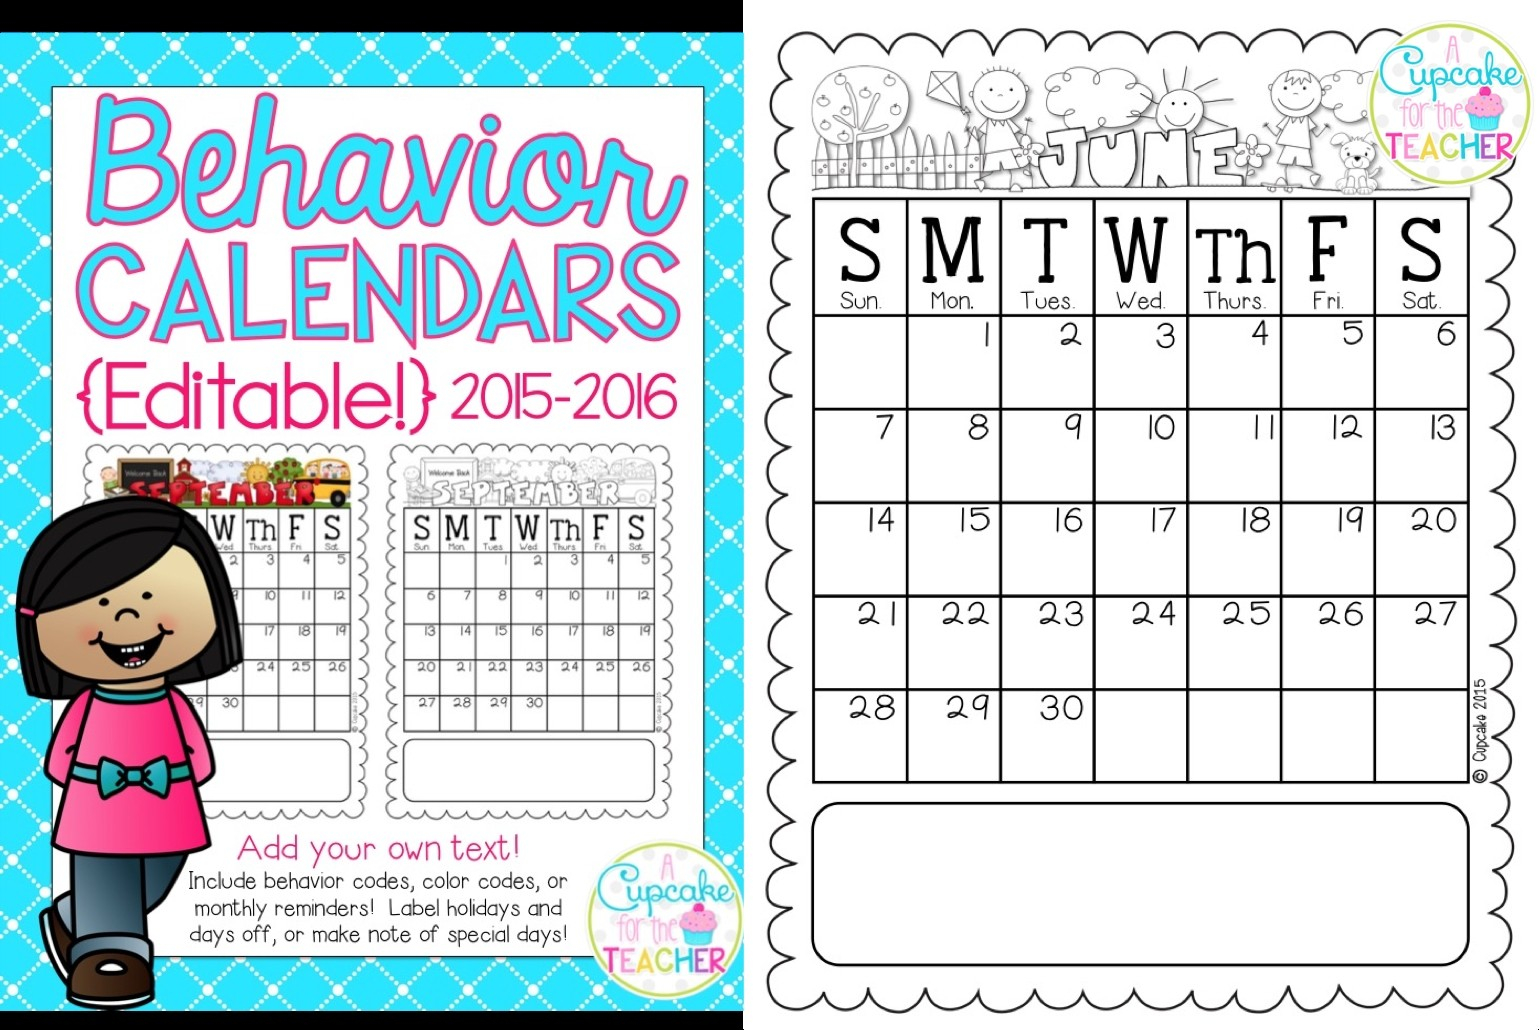 Monthly Behavior Calendar Template - Free Calendar Collection